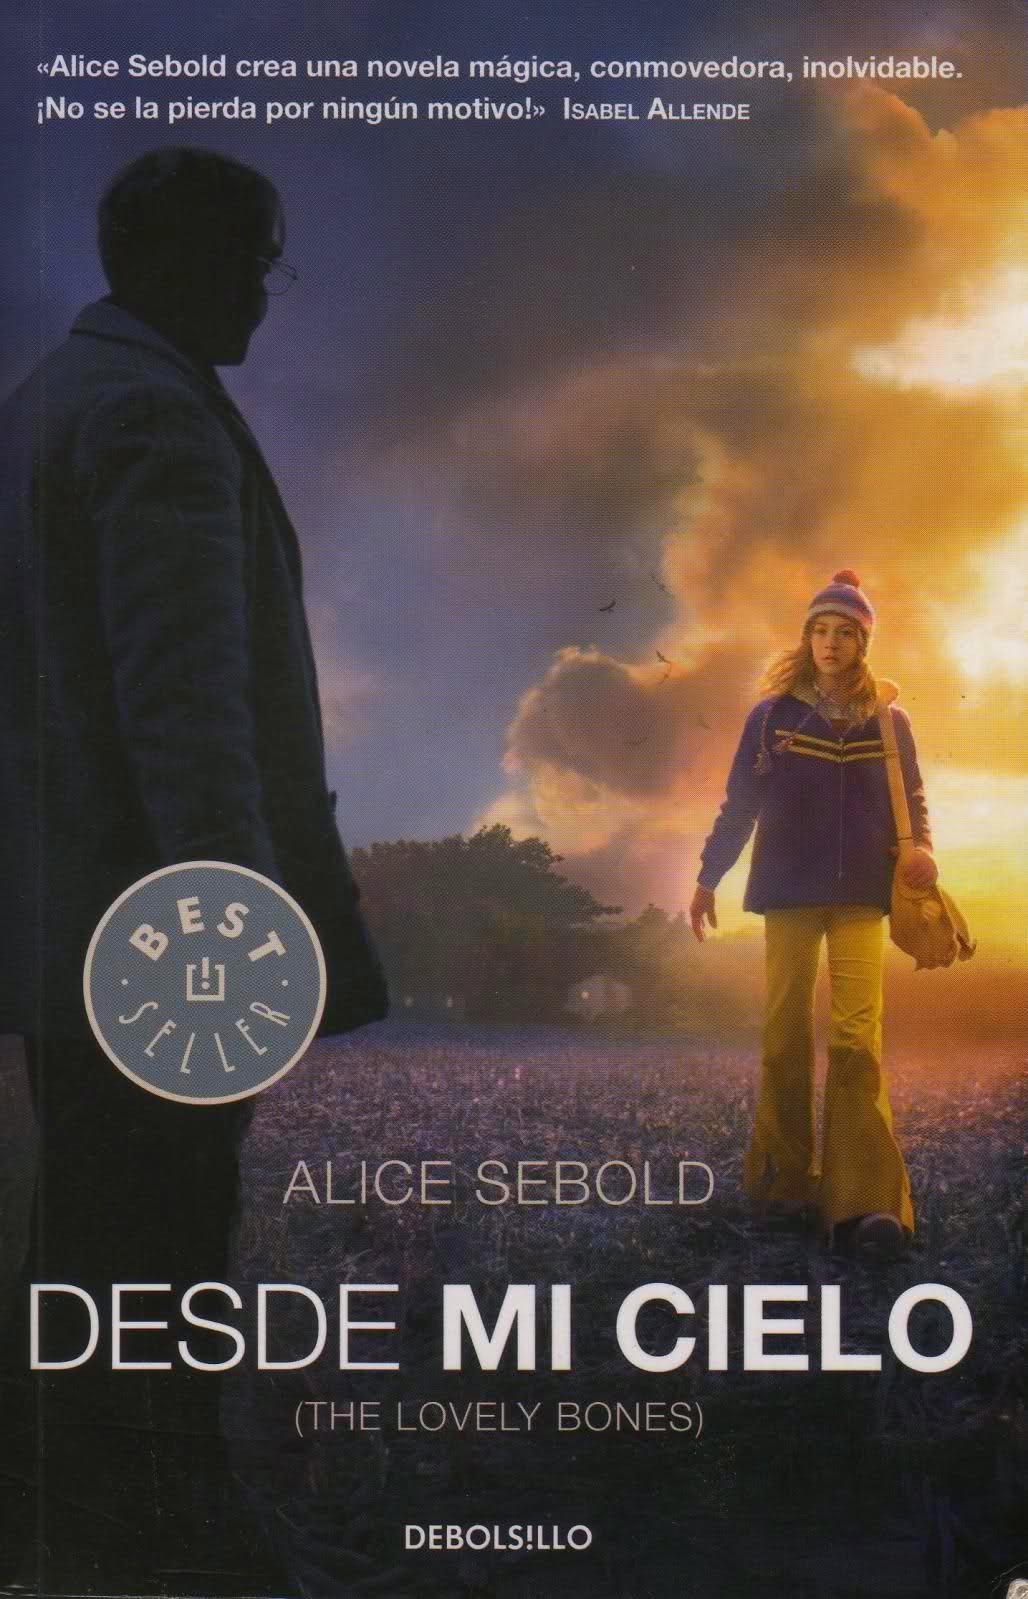 http://mywingsofbooks.blogspot.com/p/desde-mi-cielo-alice-se.html